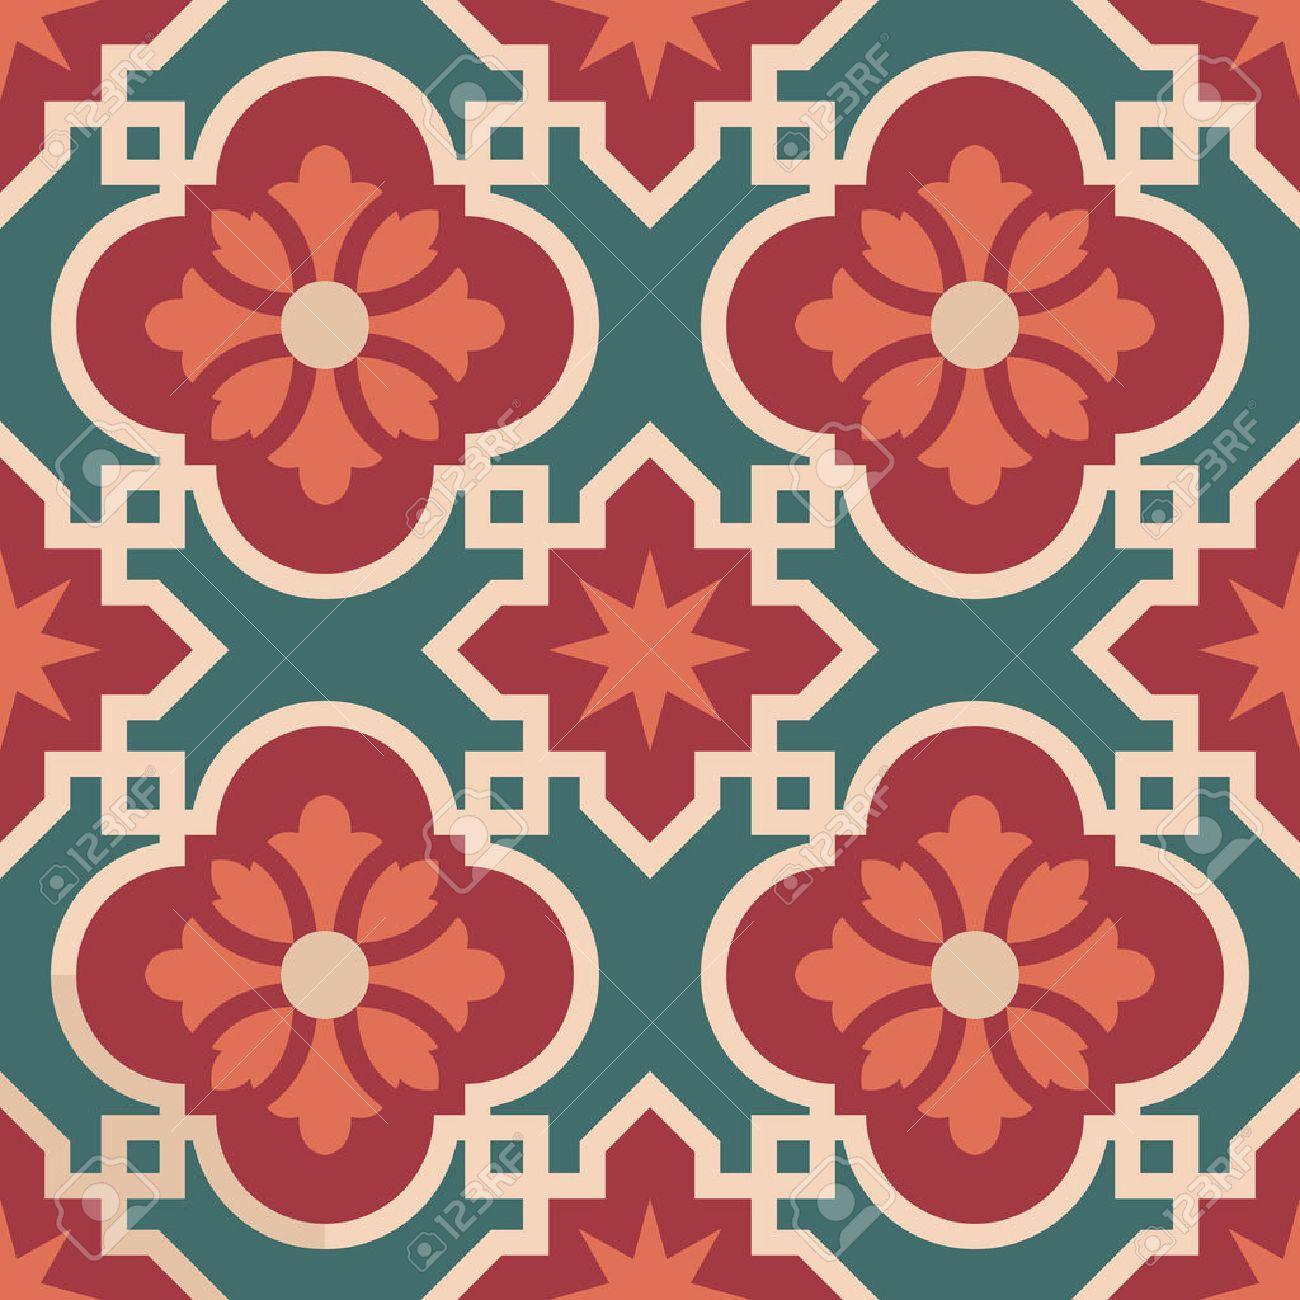 Vintage ceramic mosaic floor tile seamless pattern, traditional ornate red floral design. EPS10 vector. - 55093996